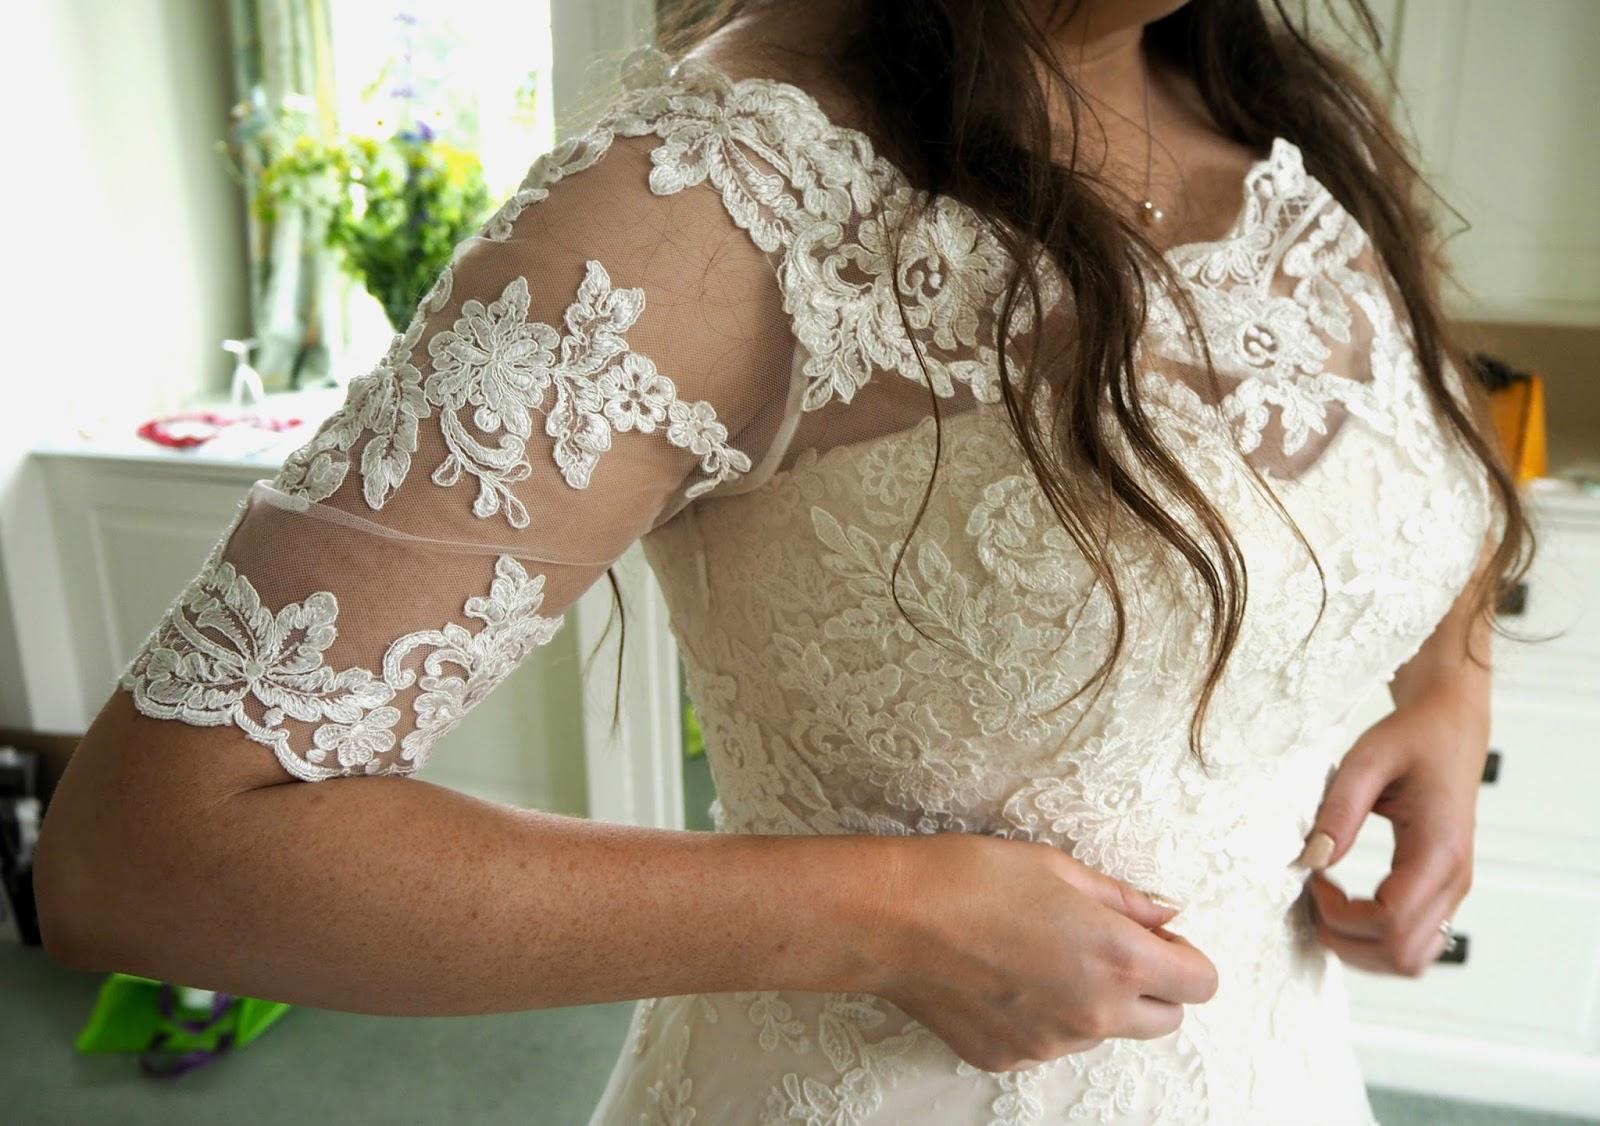 The wedding top